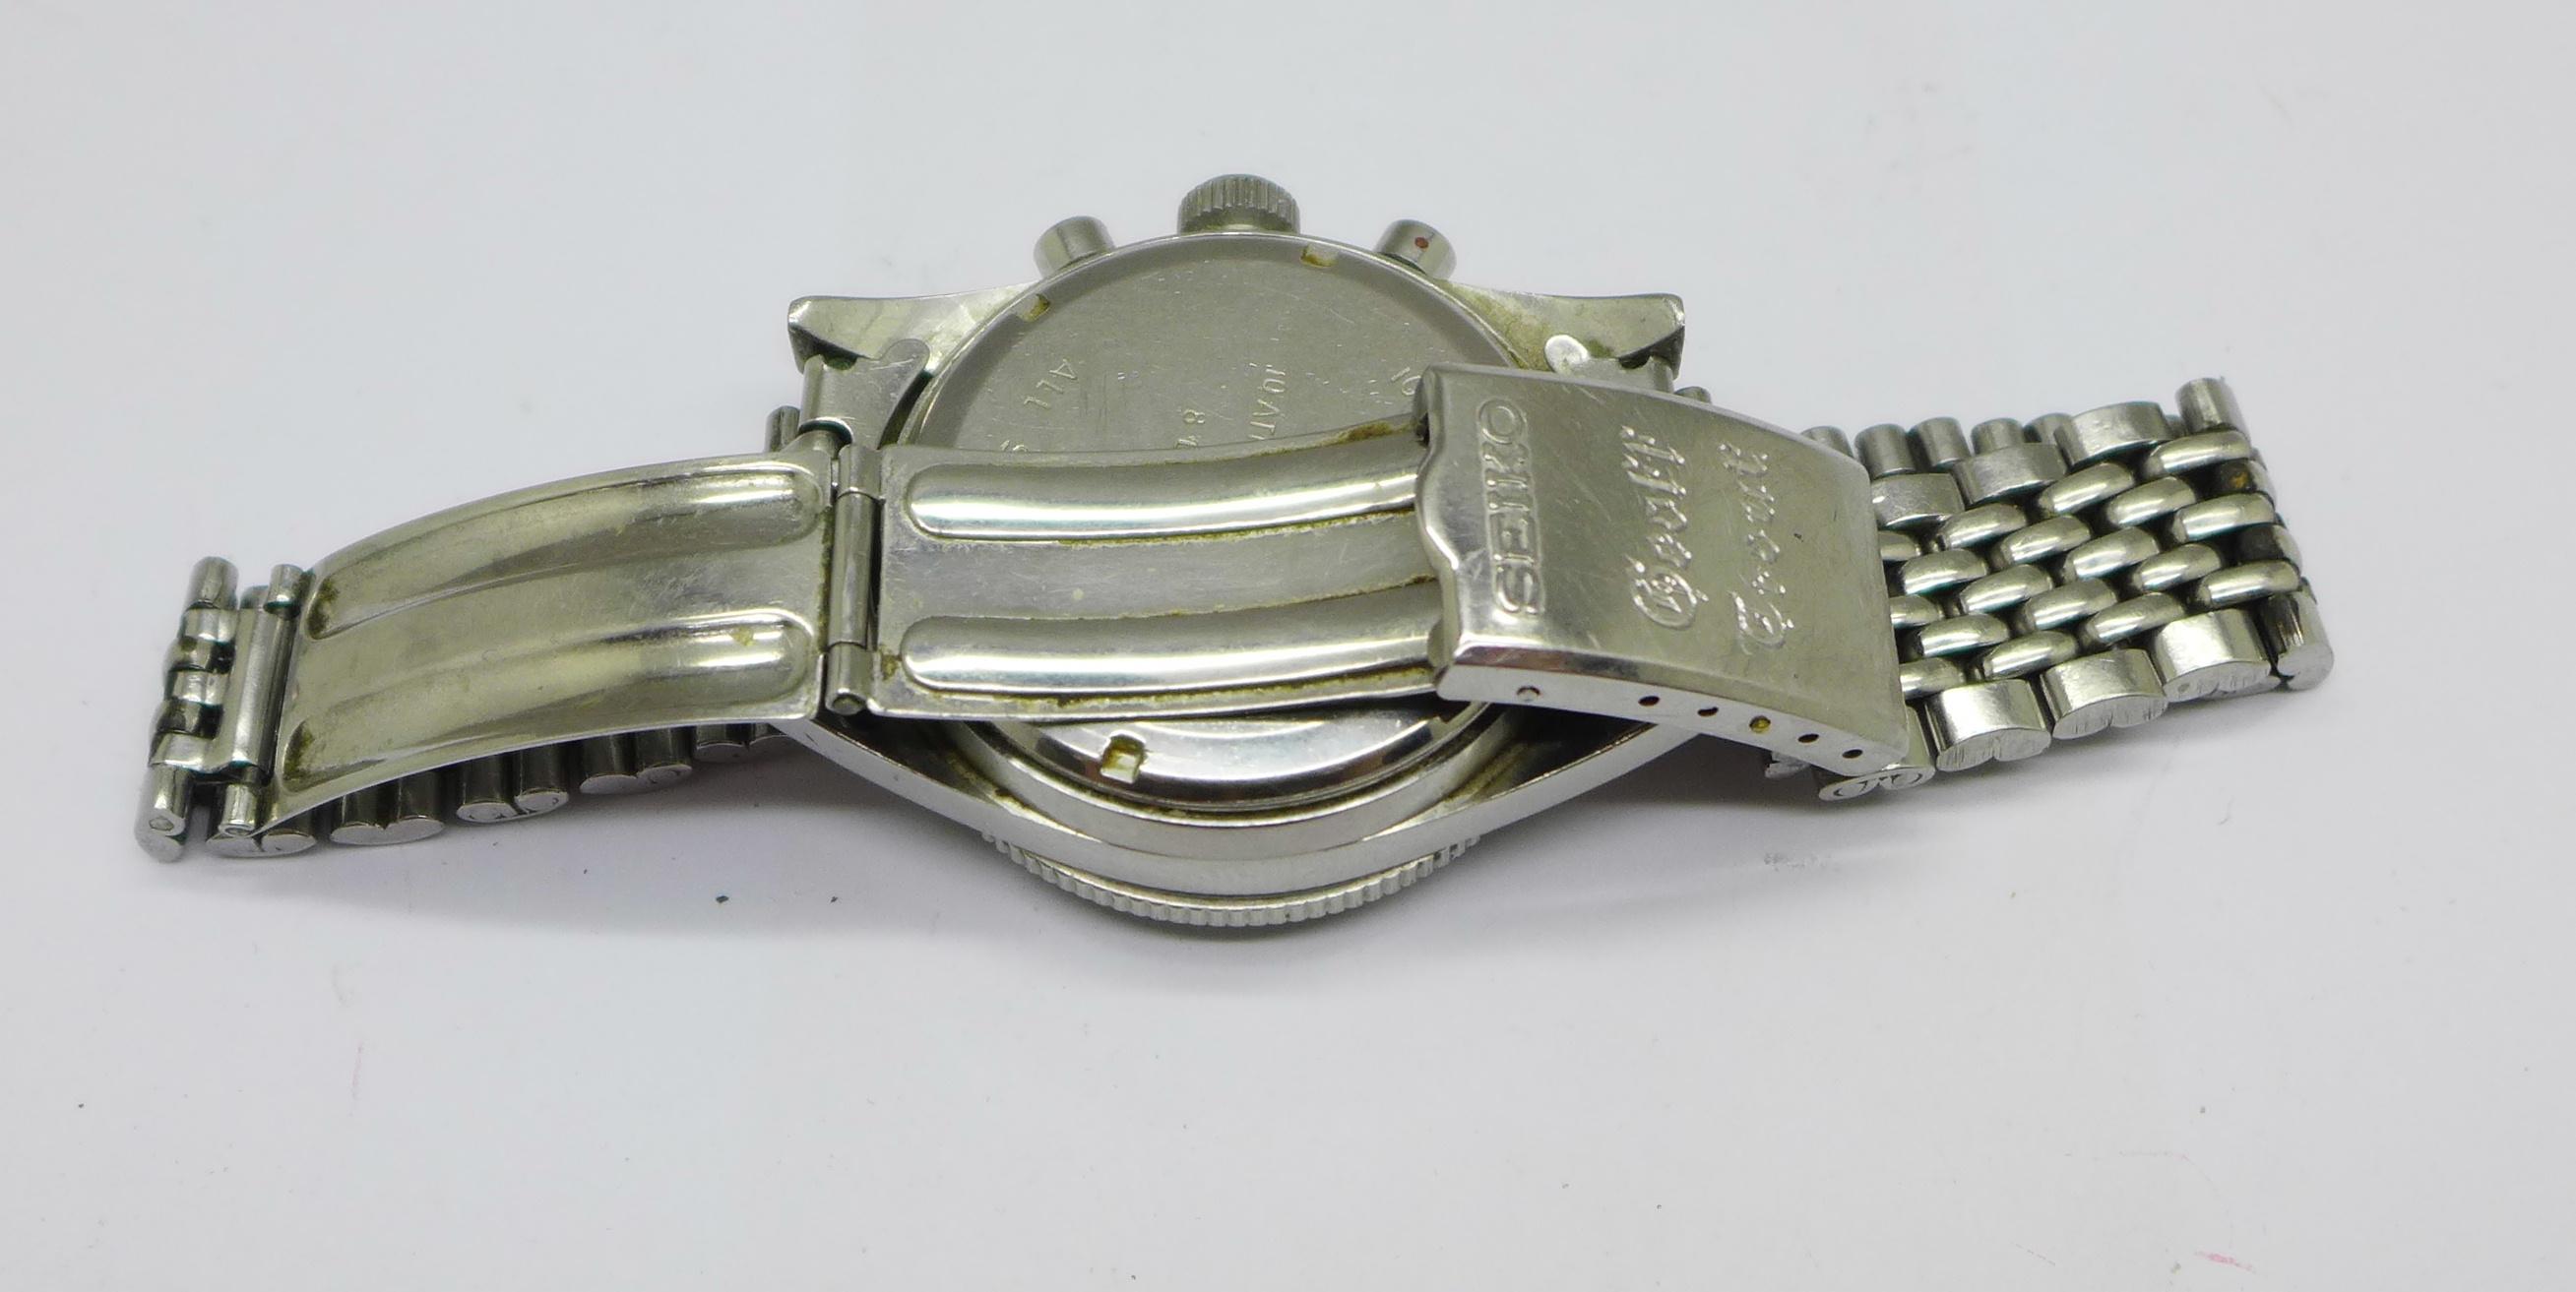 A Yema Yachtingraf 17 jewels chronograph wristwatch on a Seiko bracelet strap, chronograph buttons - Image 5 of 8